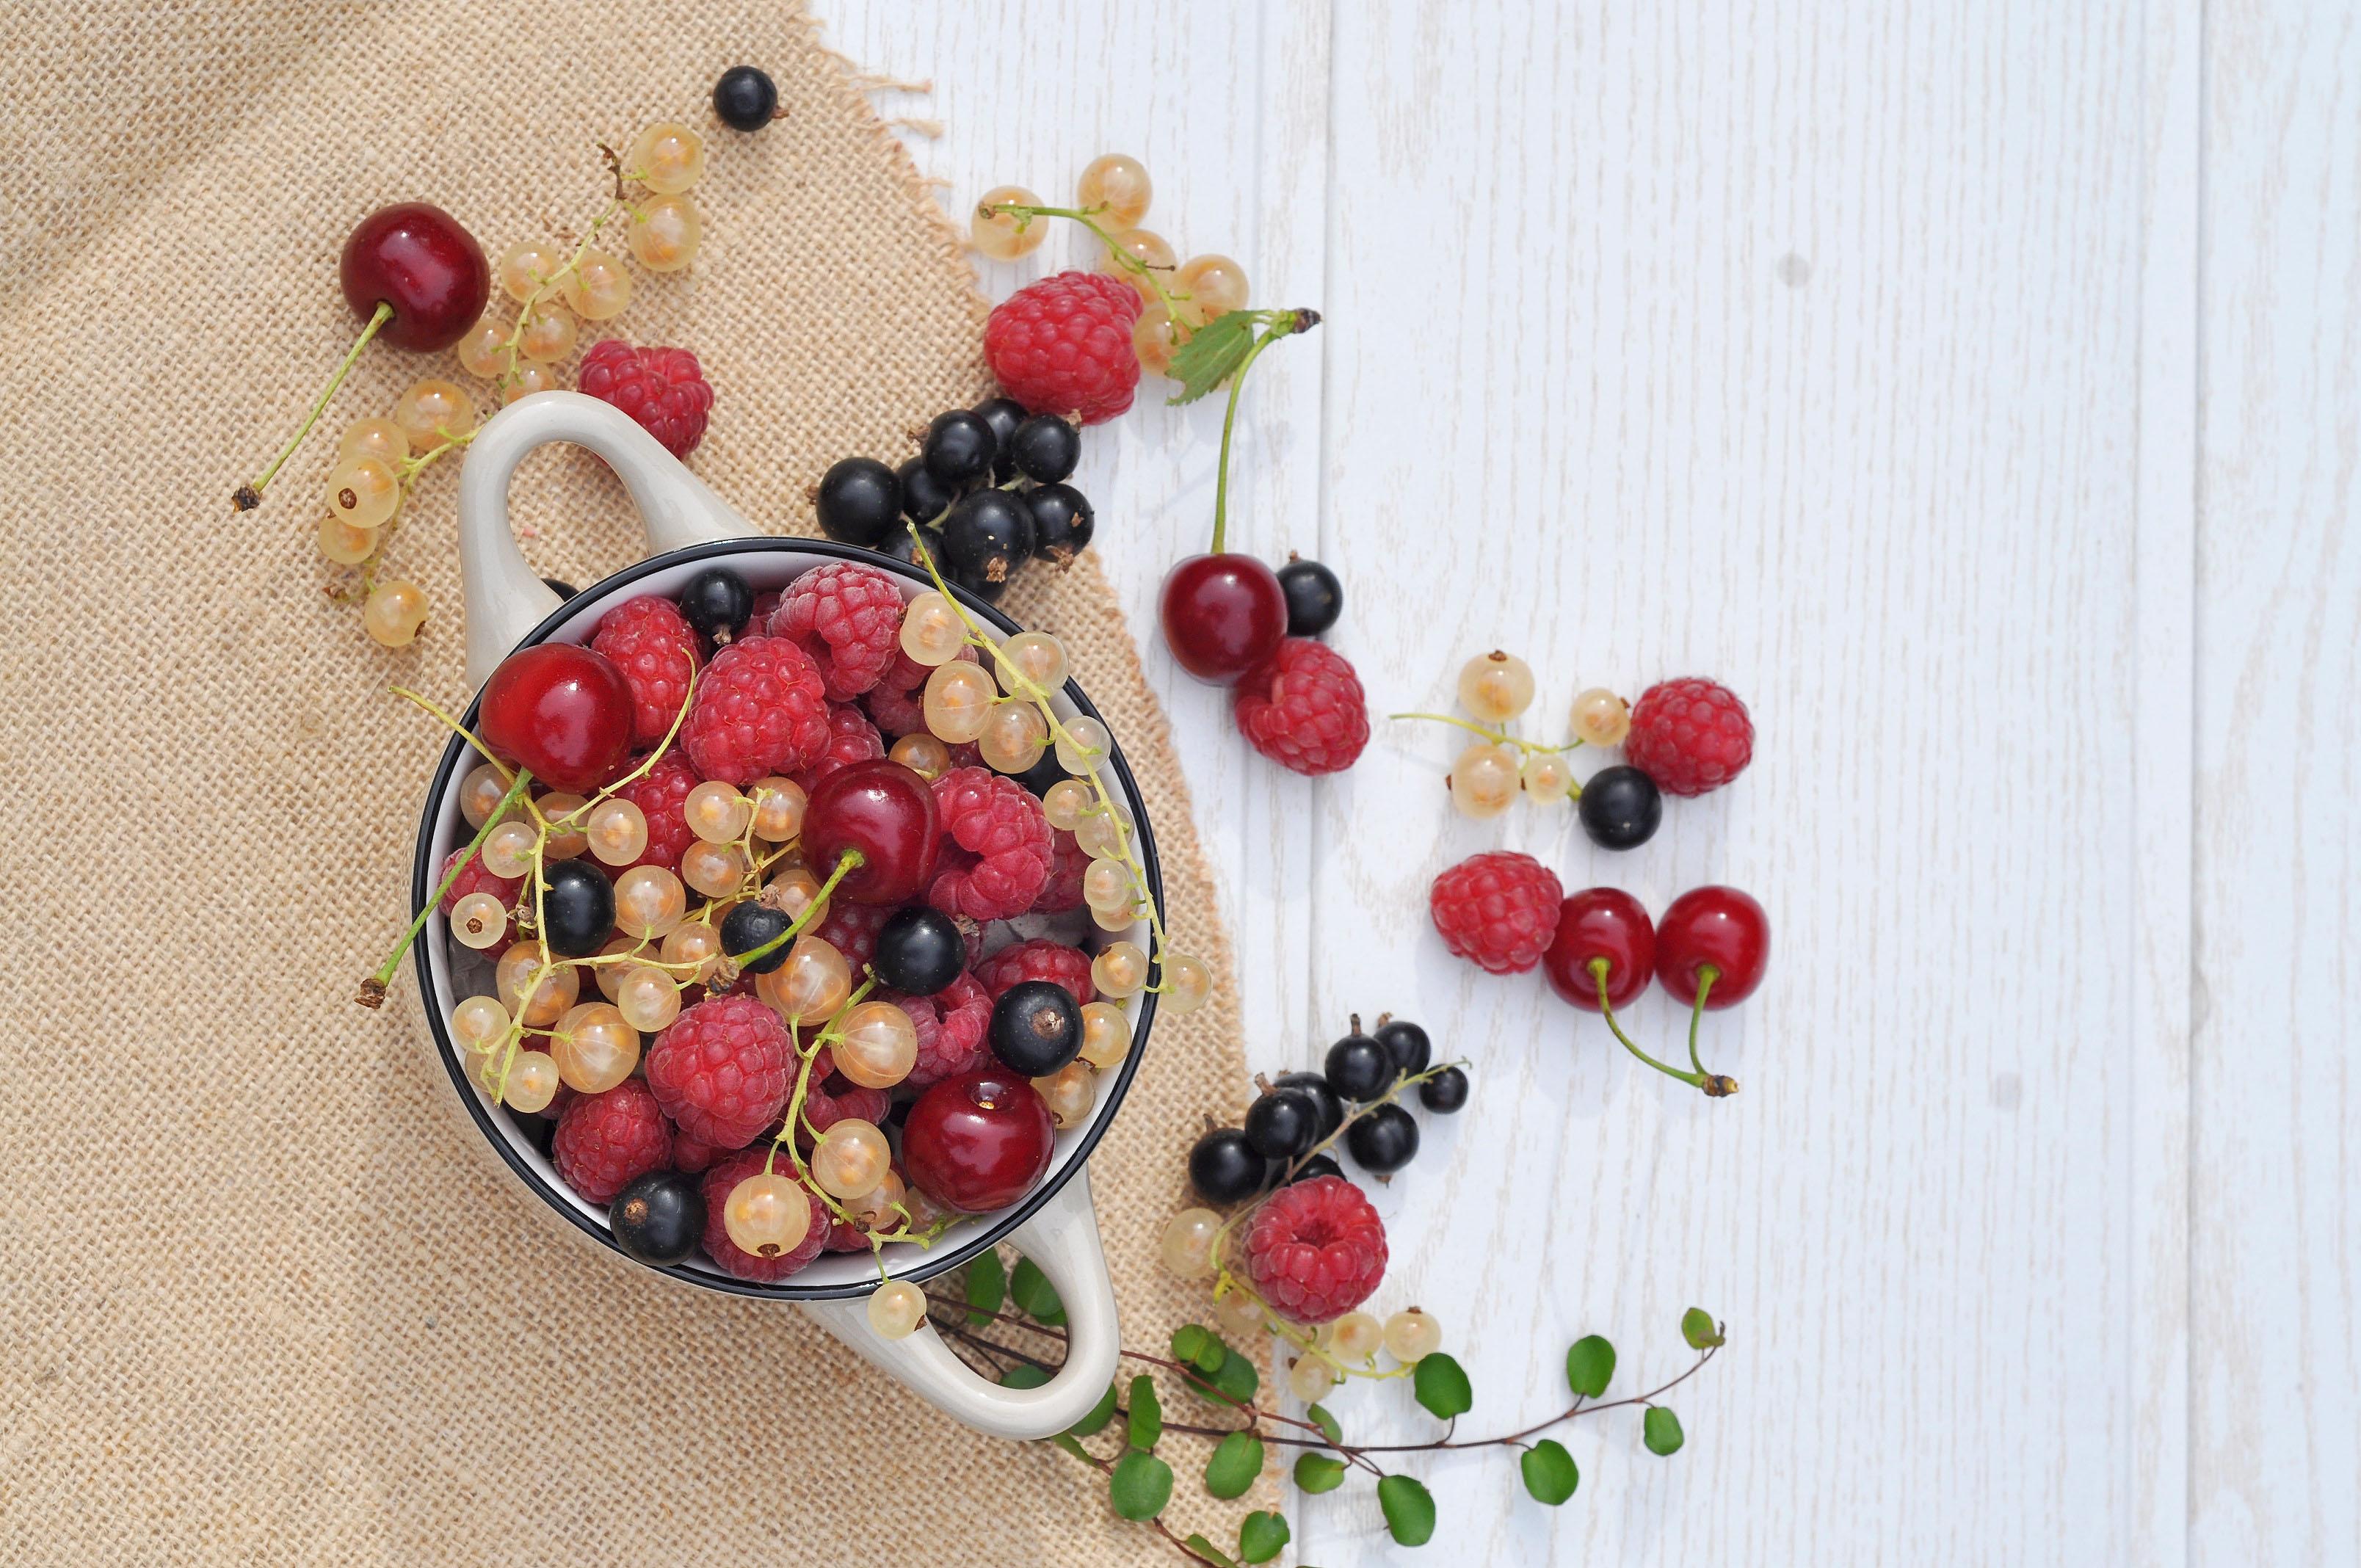 Frische Beeren im Sommer